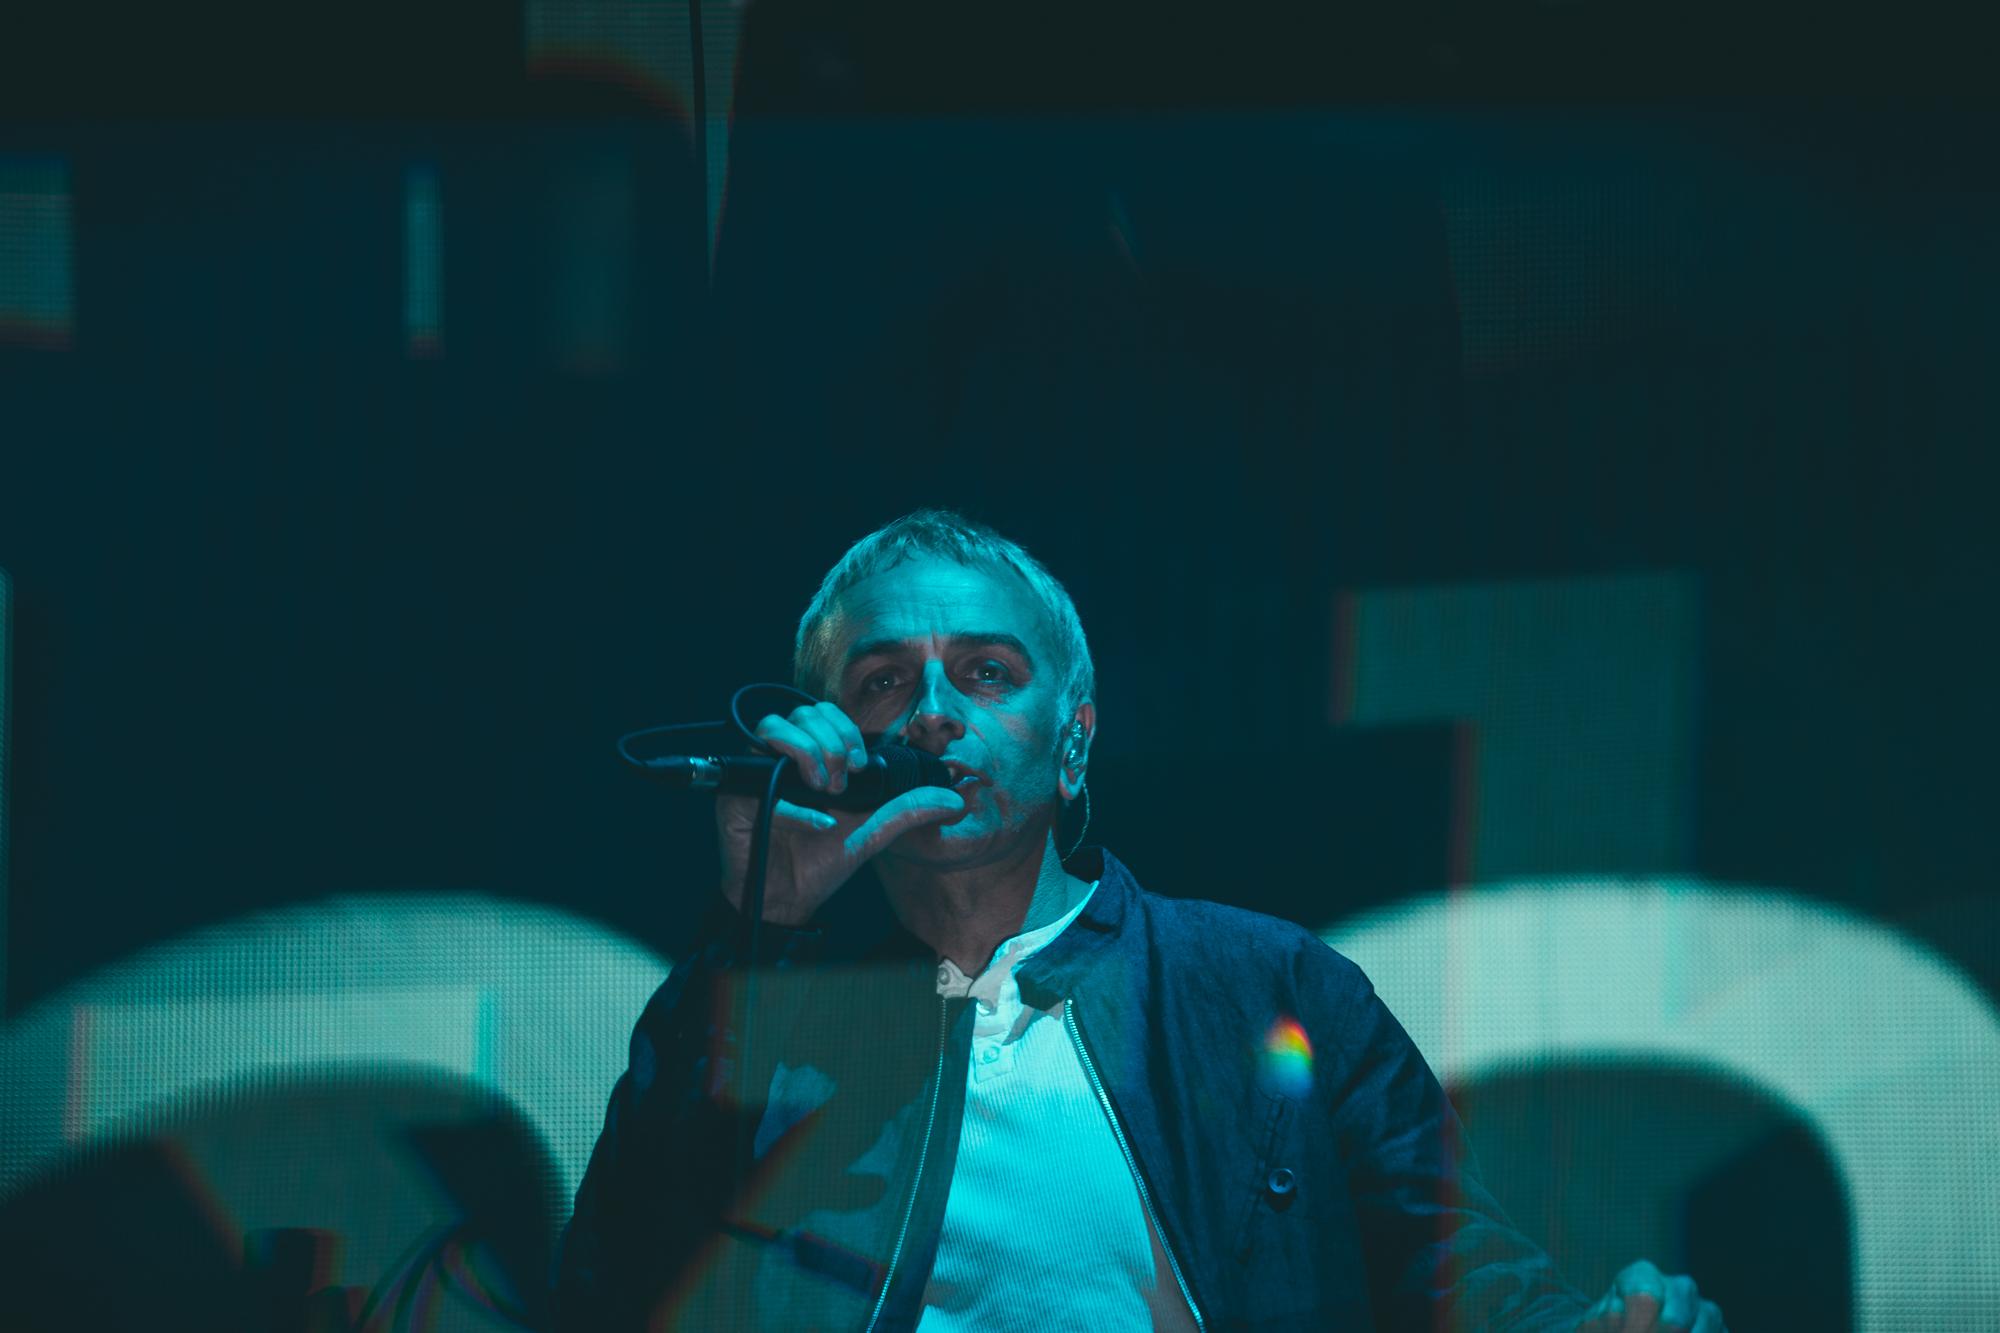 Underworld-Festival Ceremonia-Mexico-Foro Pegaso-04.02.2017-Daniel Patlan_Desde 1989 (2 of 21).jpg